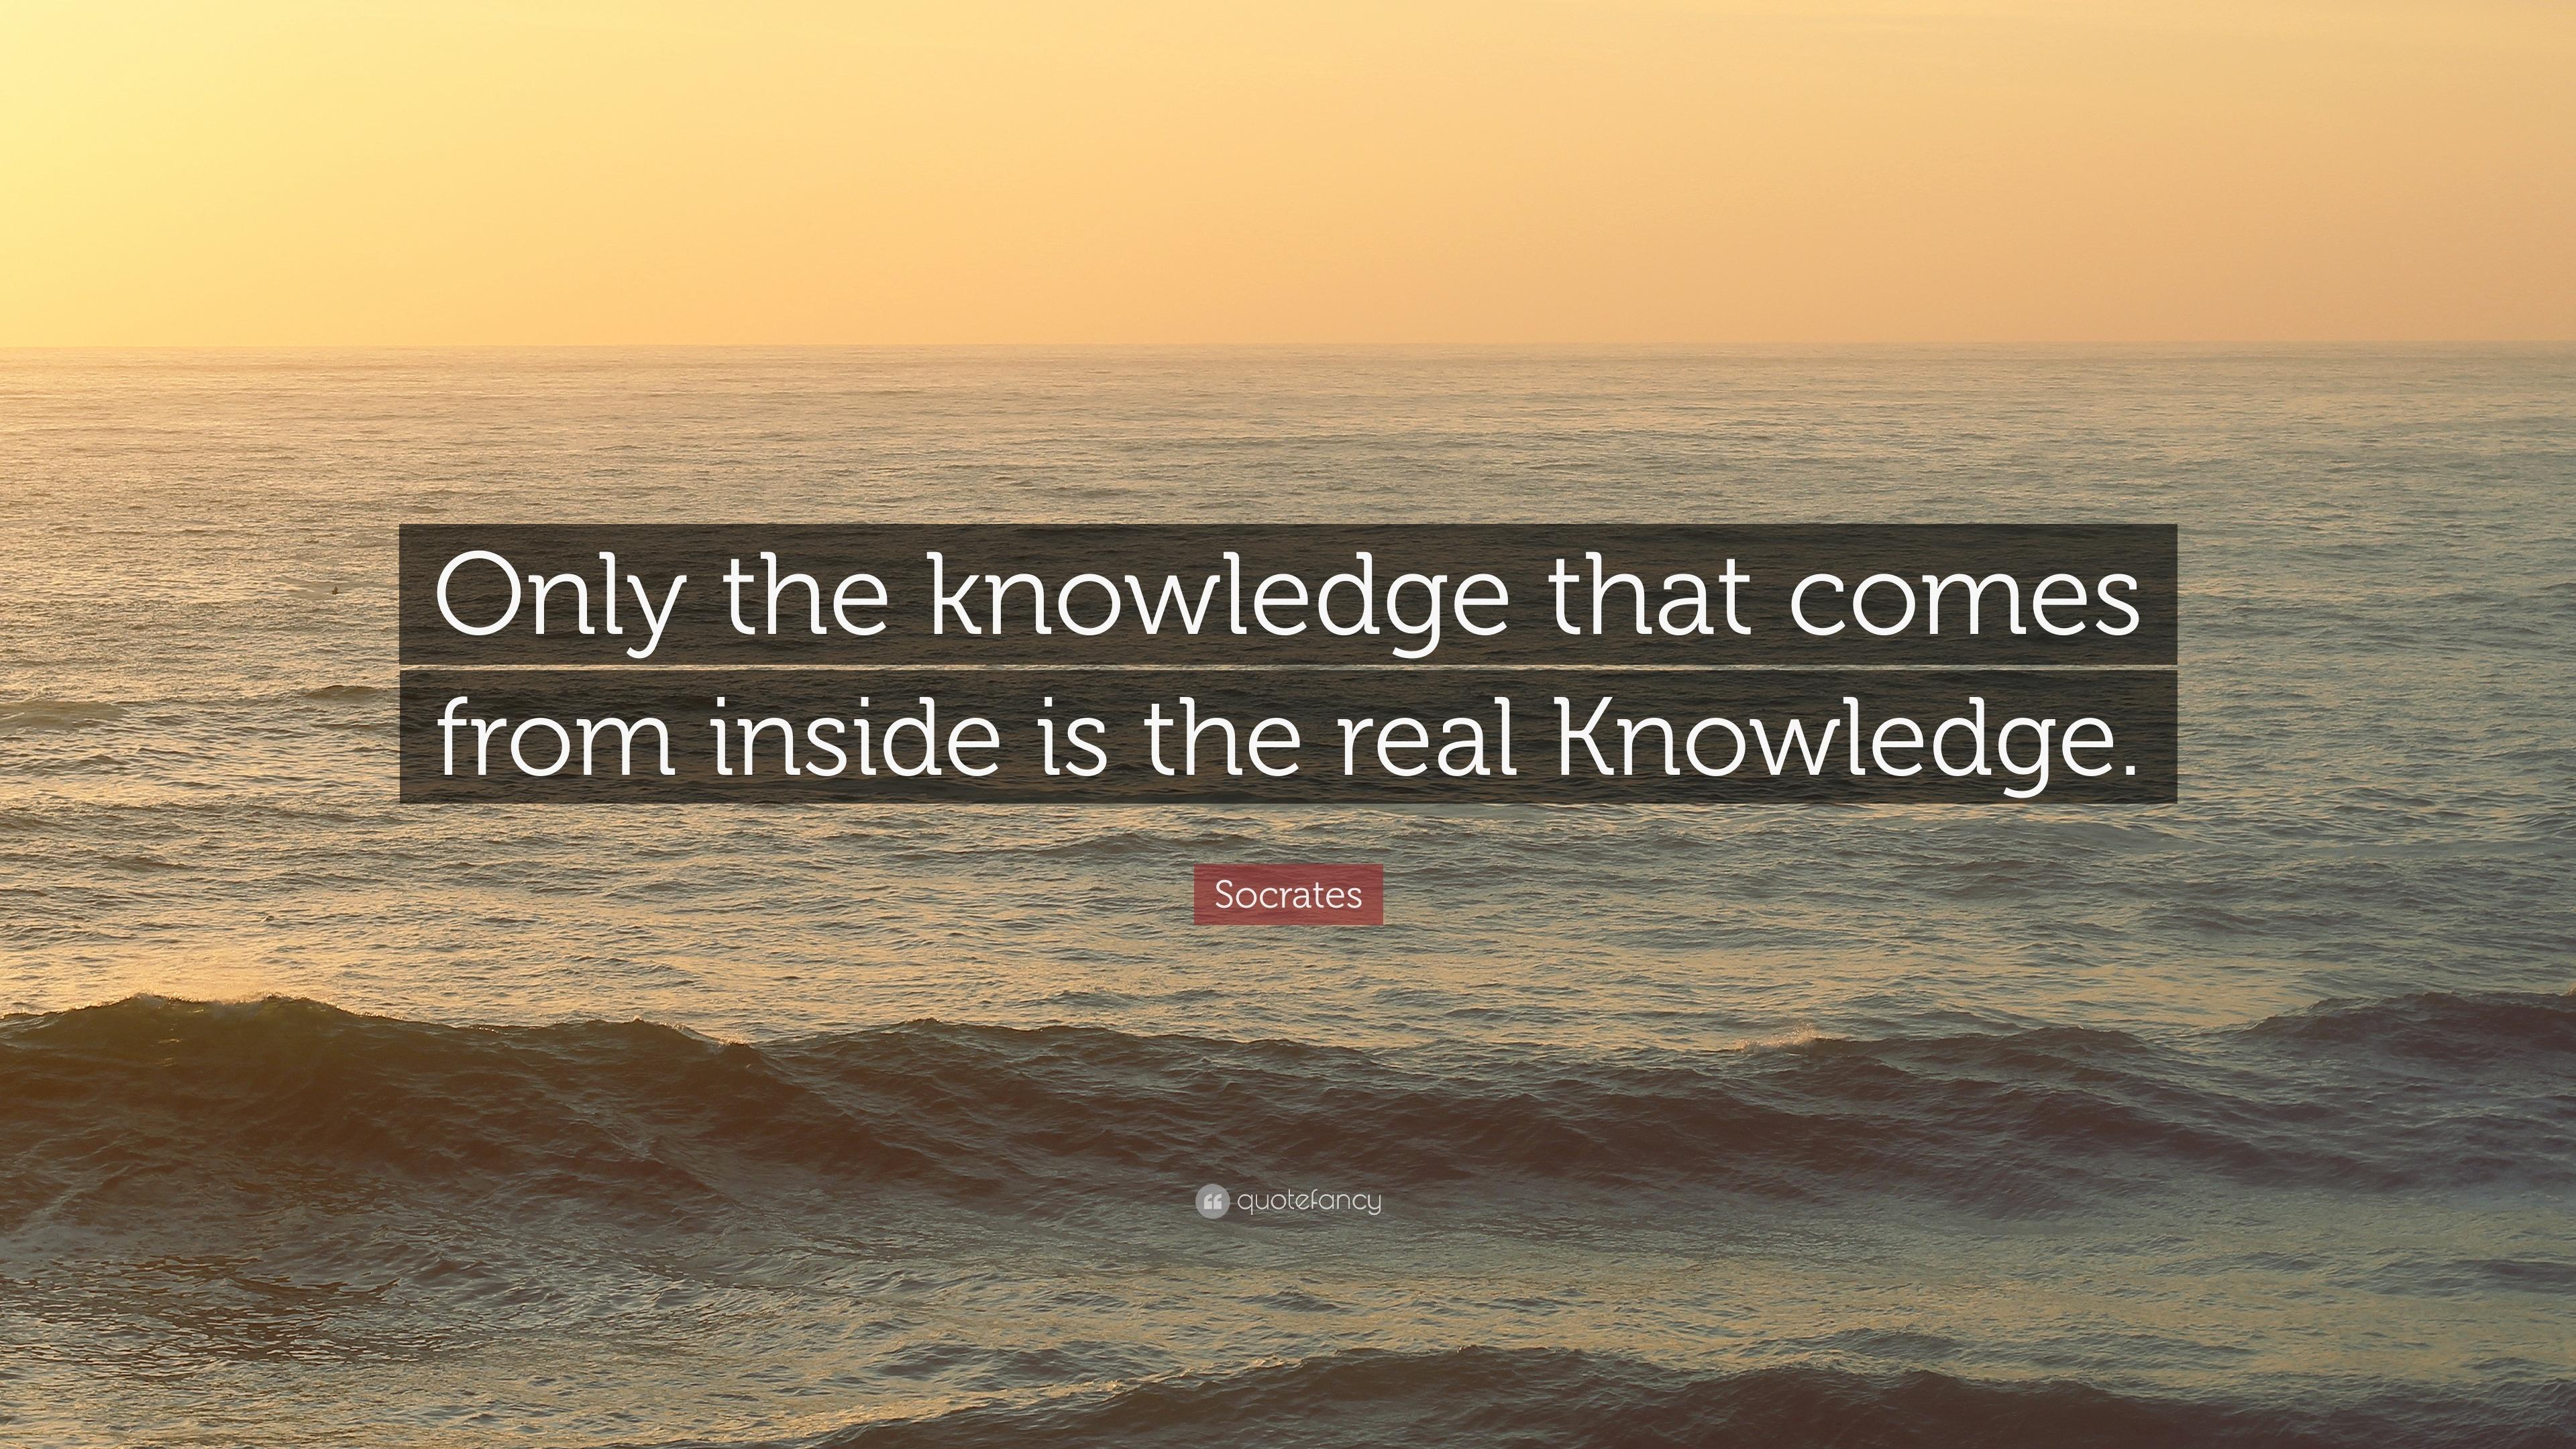 Socrates Quotes (100 wallpapers) - Quotefancy